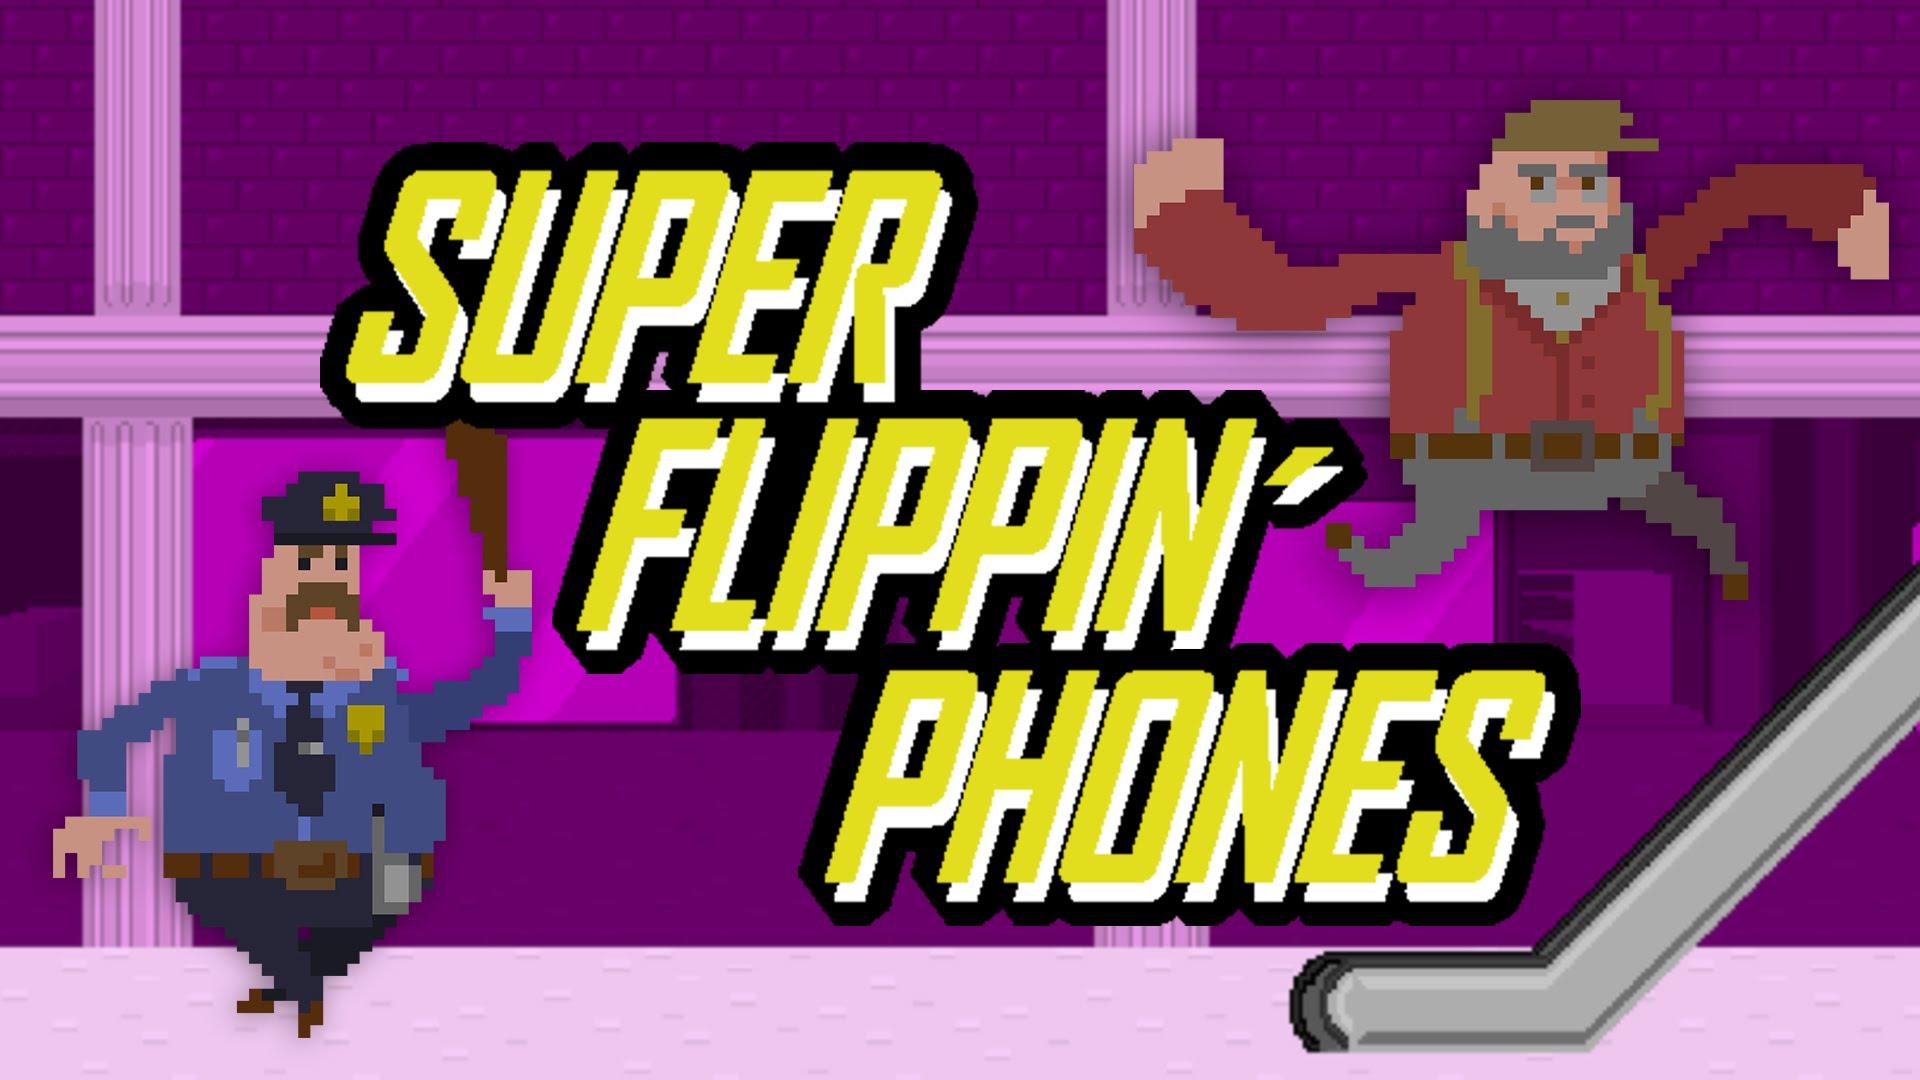 'Super Flippin' Phones' is mindless, phone-smashing, mall-crawling mayhem